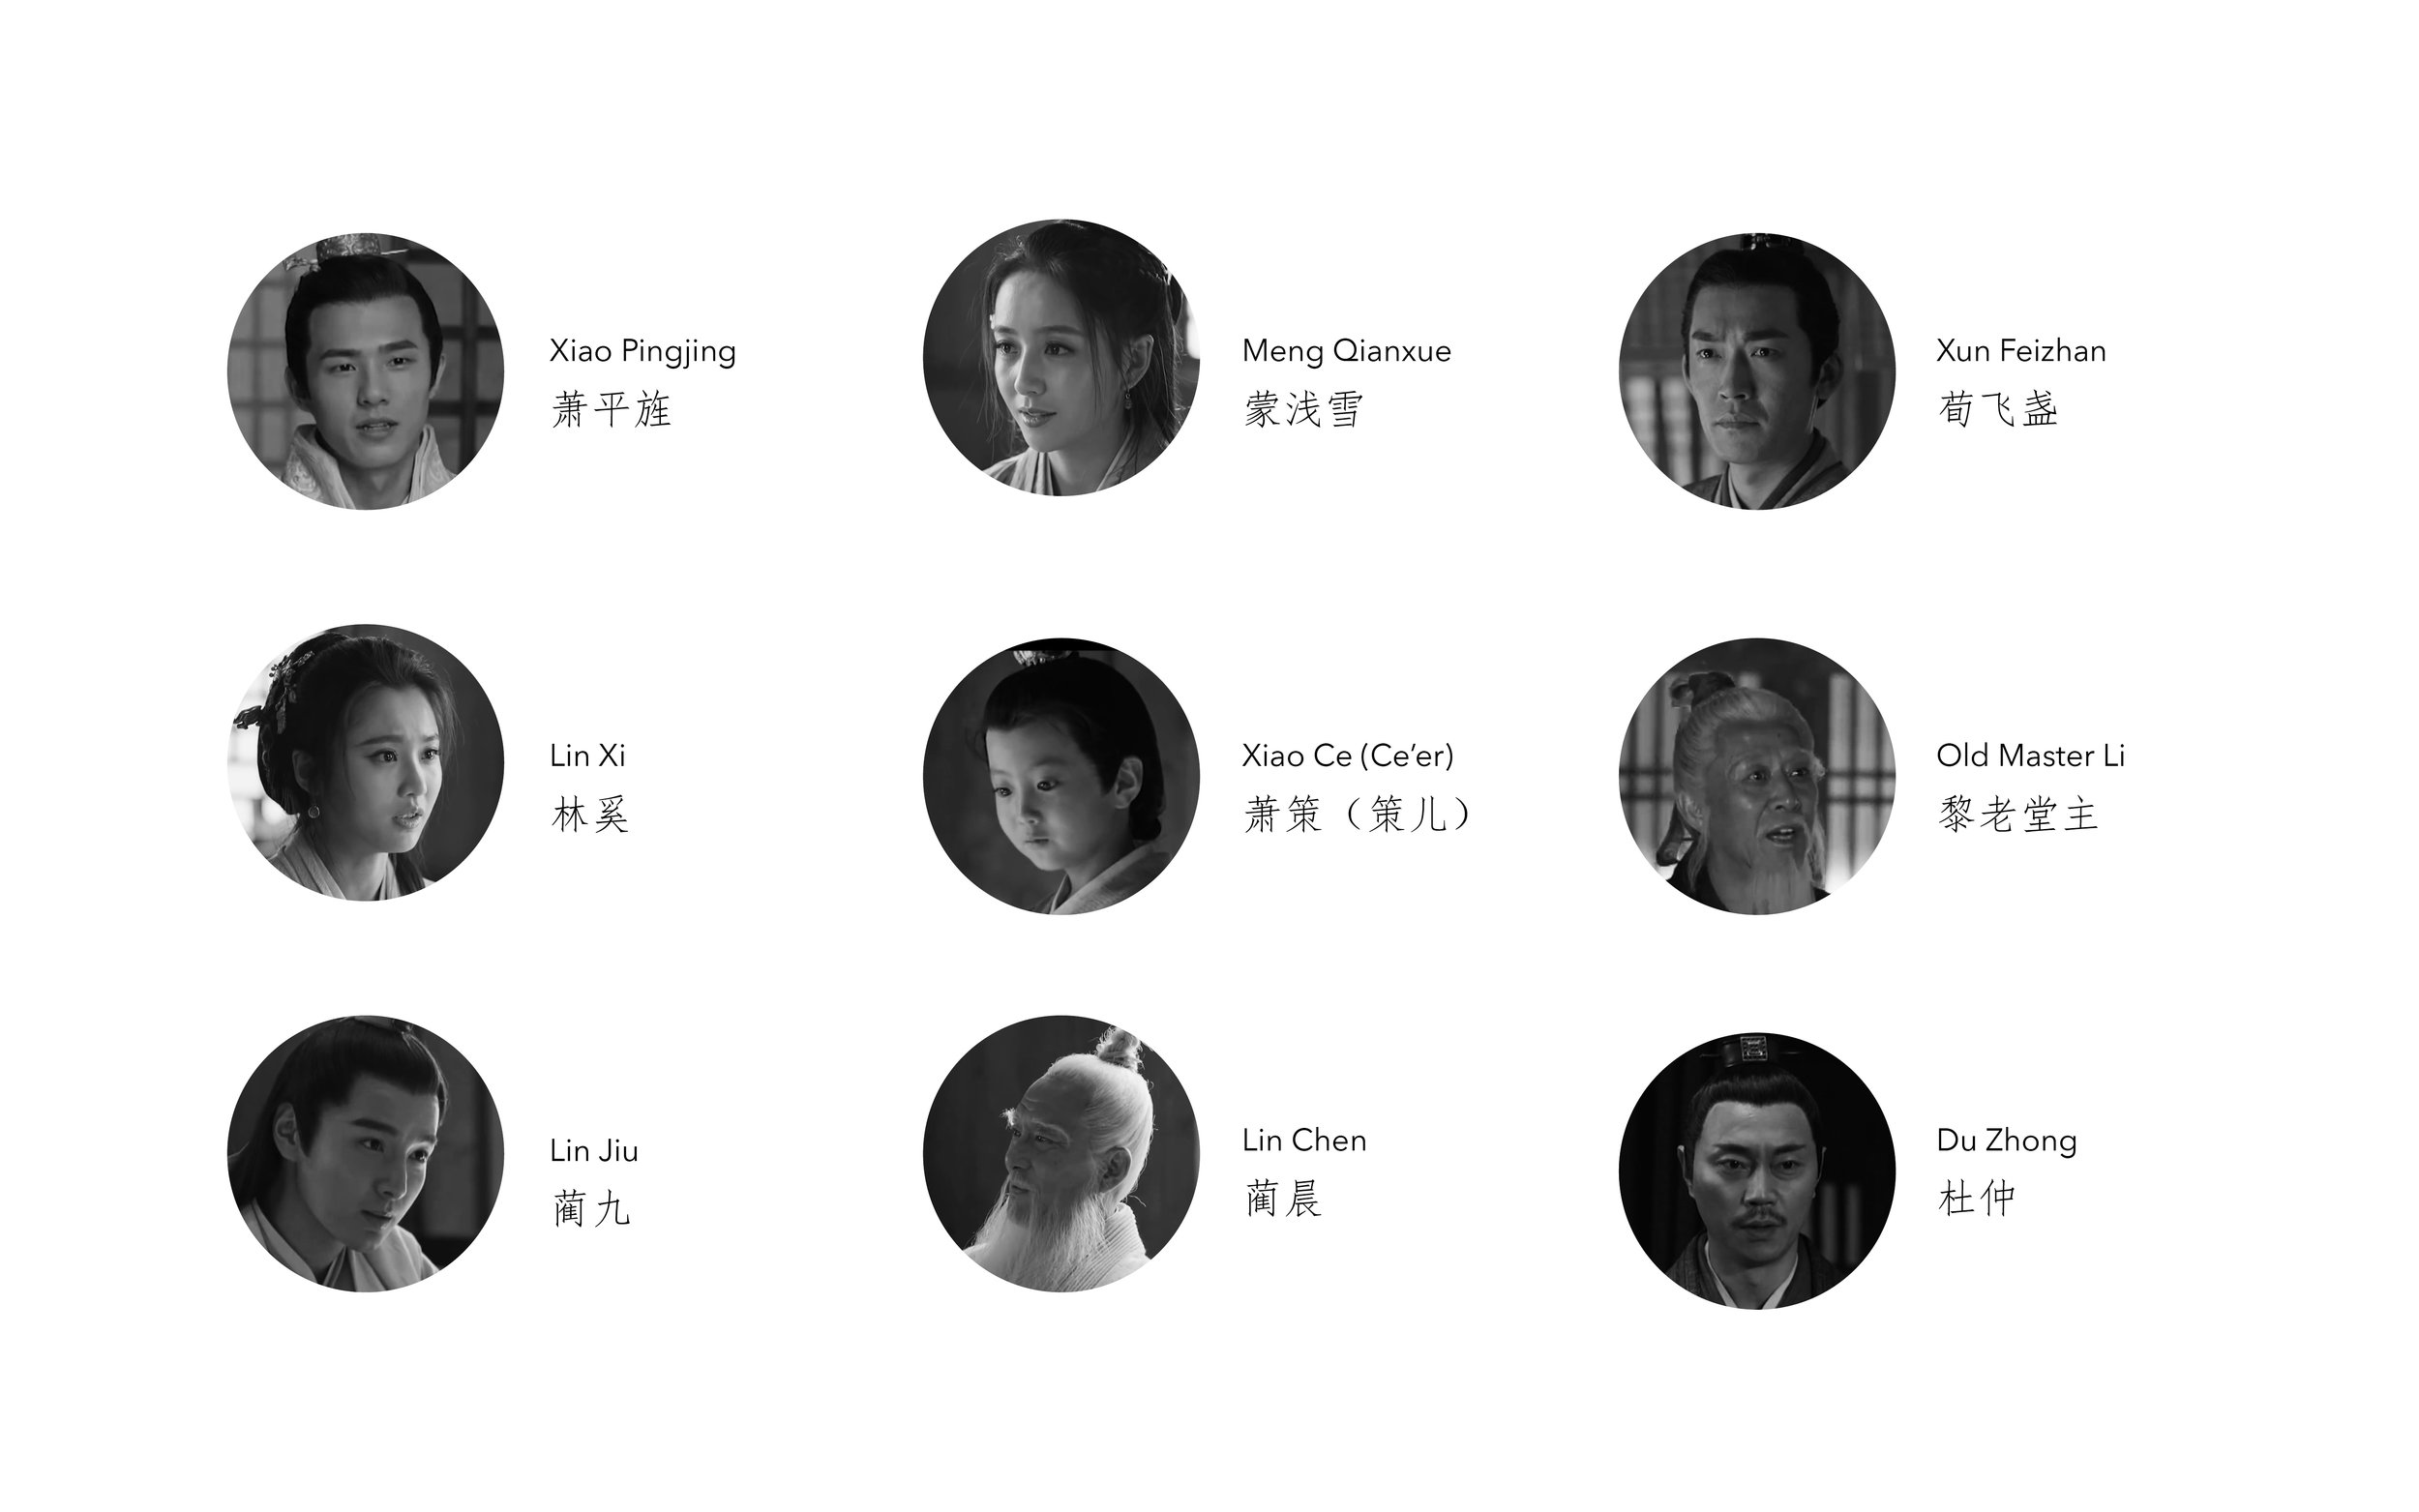 wedding characters bw.jpg